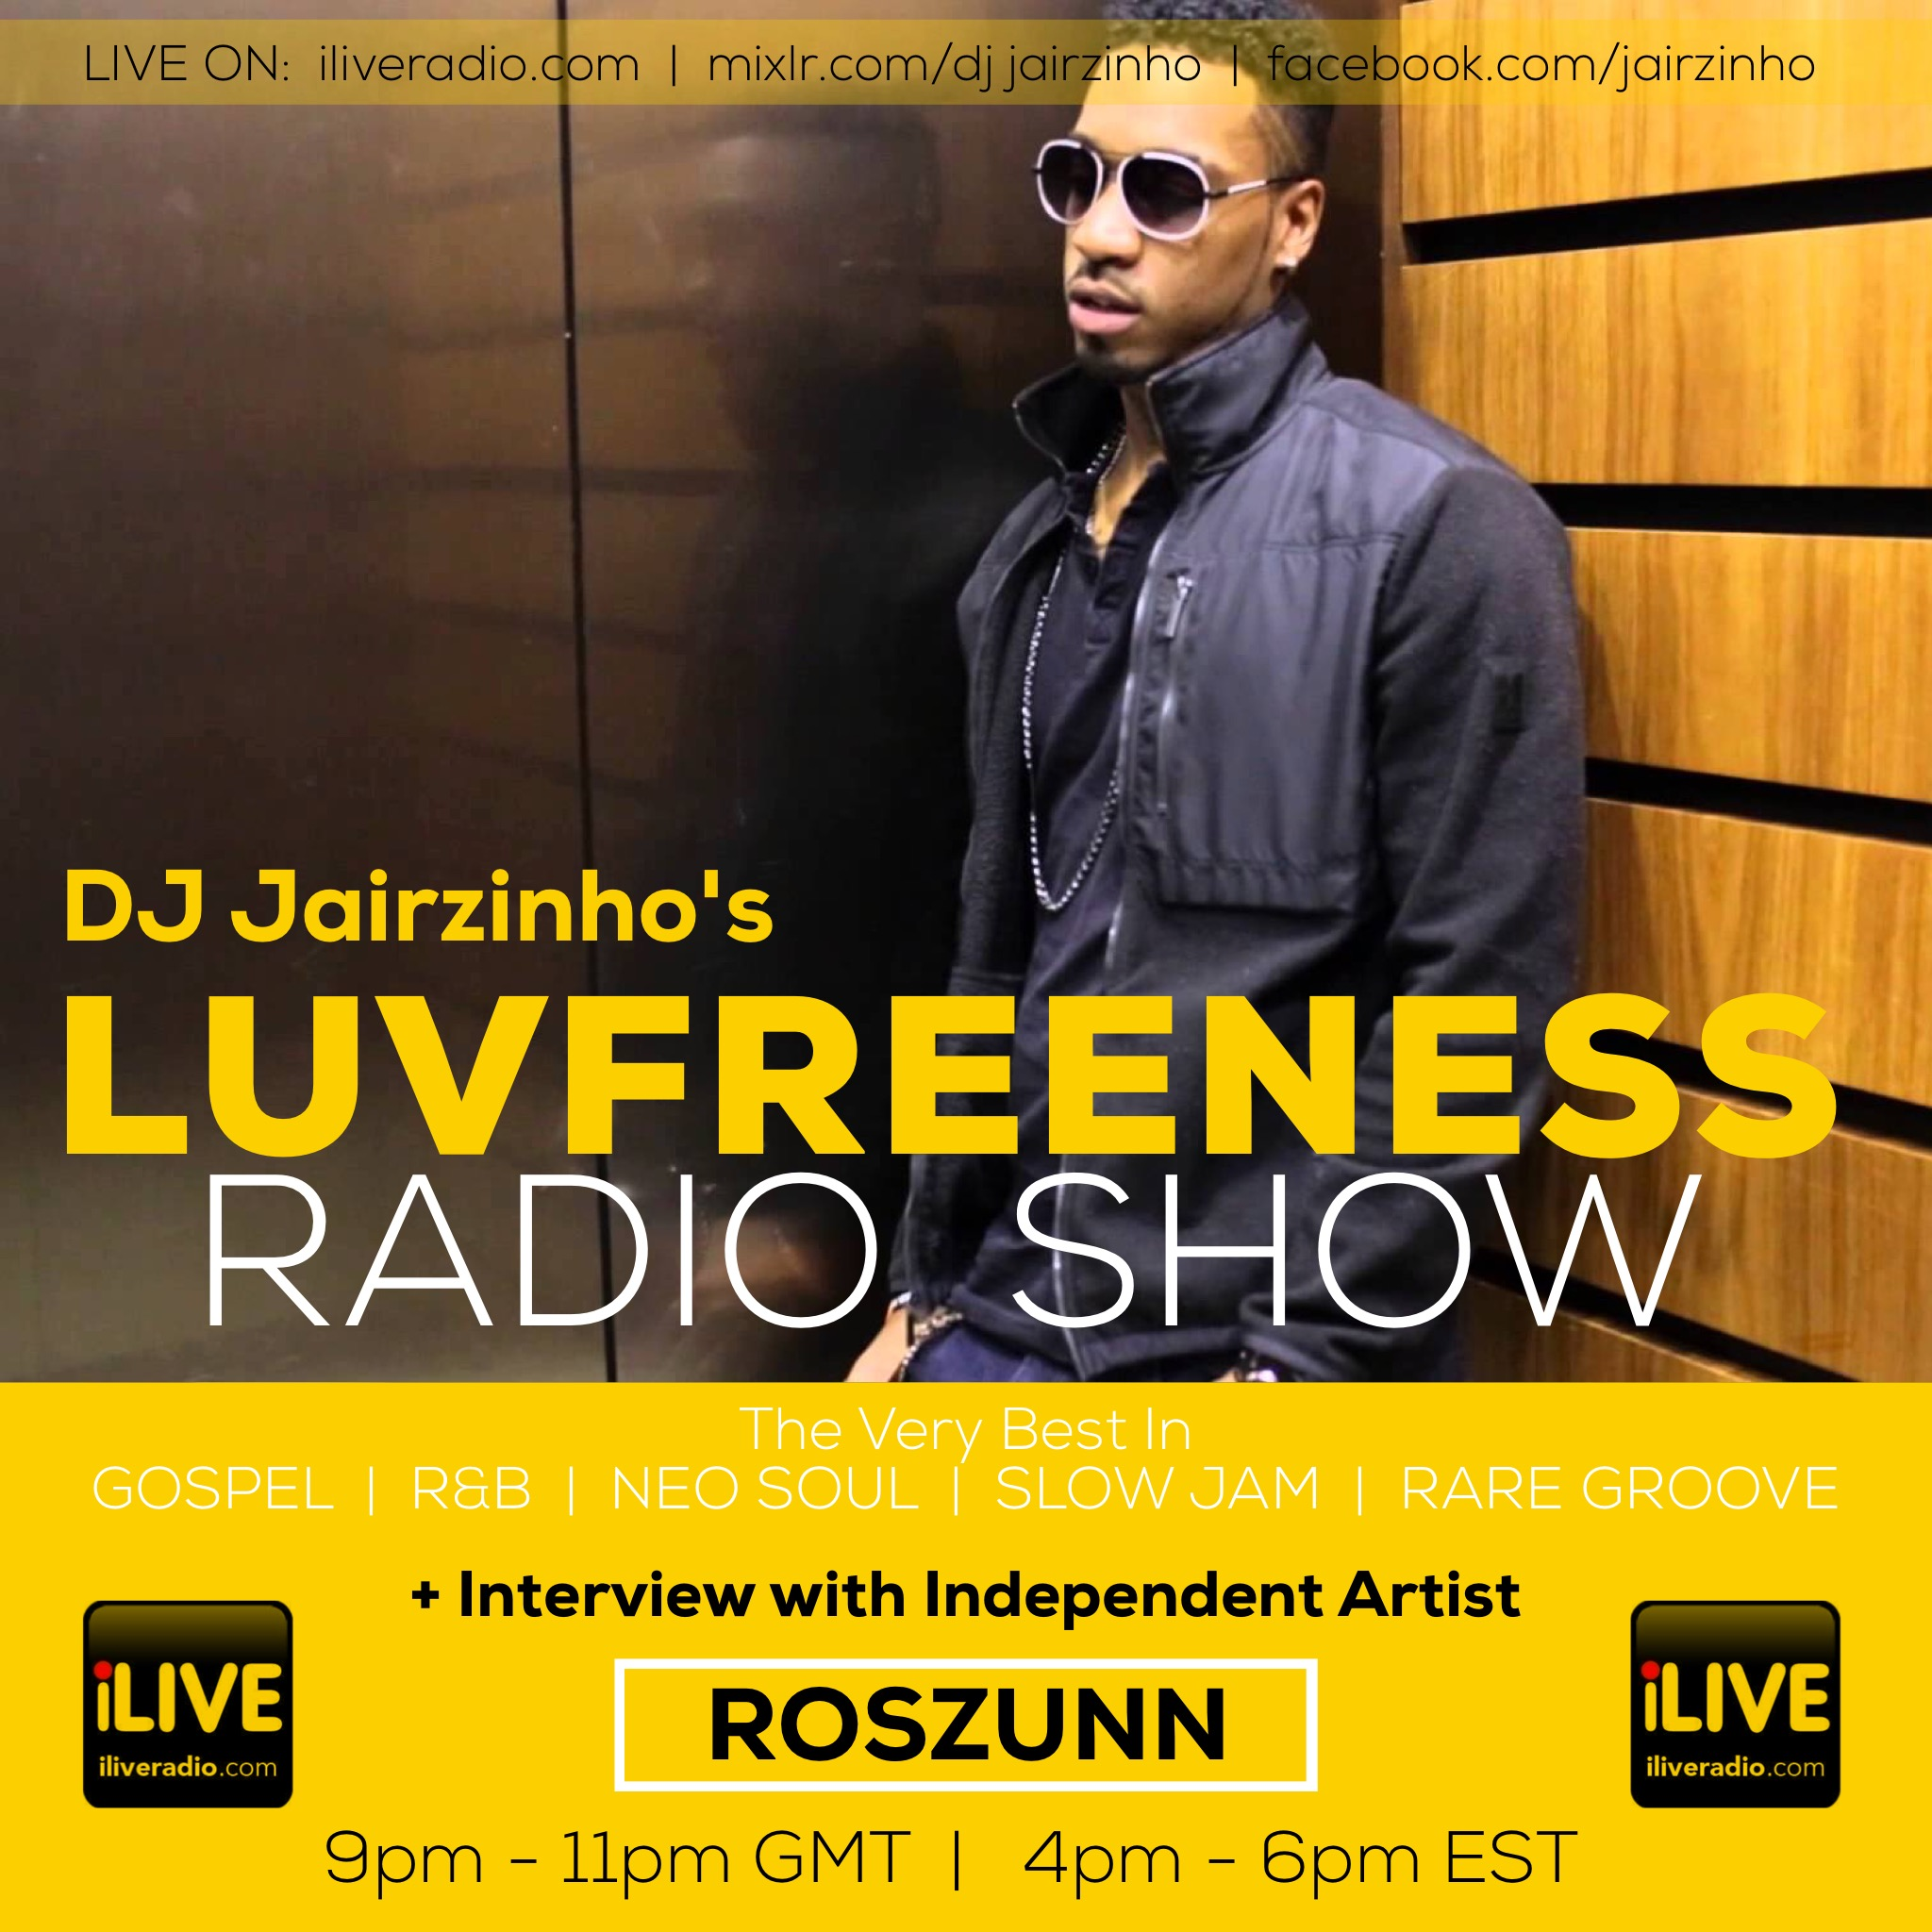 DJ Jairzinho Interviews ROSZUNN on the Luvfreeness Radio Show